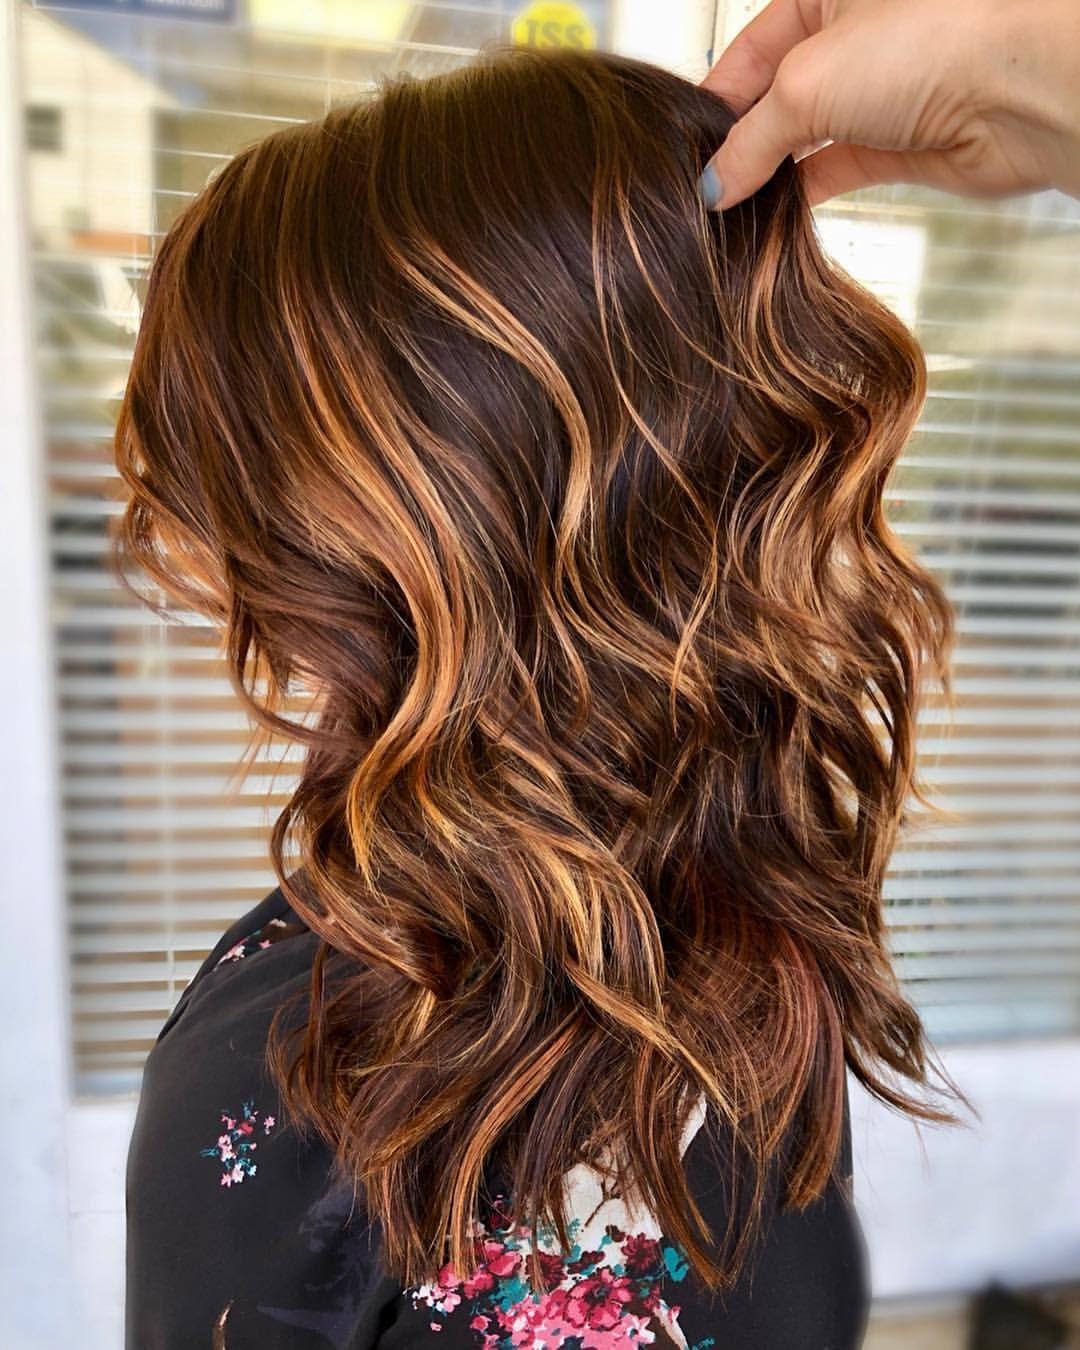 Rich Chocolate Hair With Copper Highlights Brown Hair With Highlights Hair Highlights Light Brown Hair